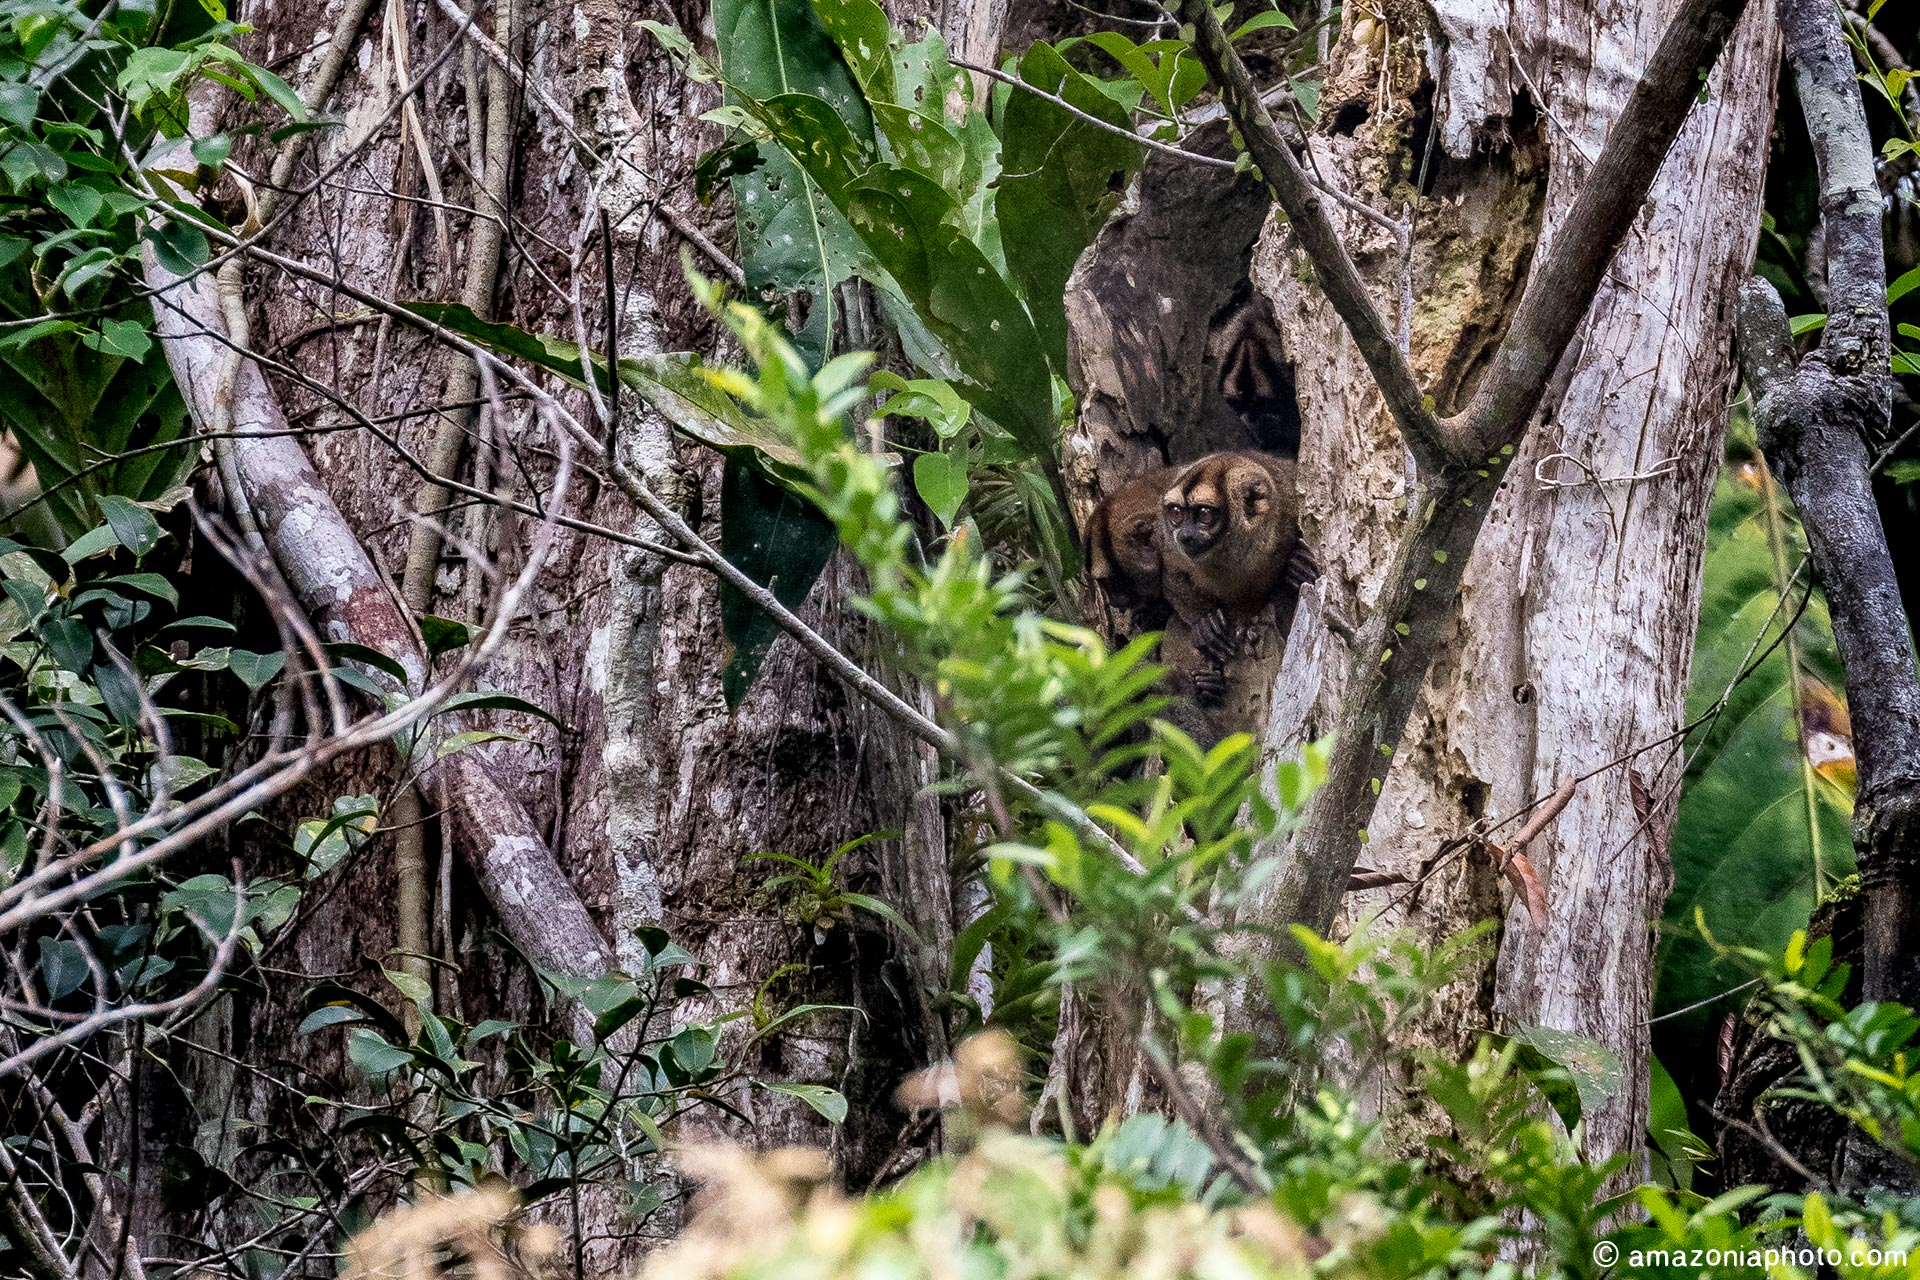 Spix's night monkey (Aotus vociferans)